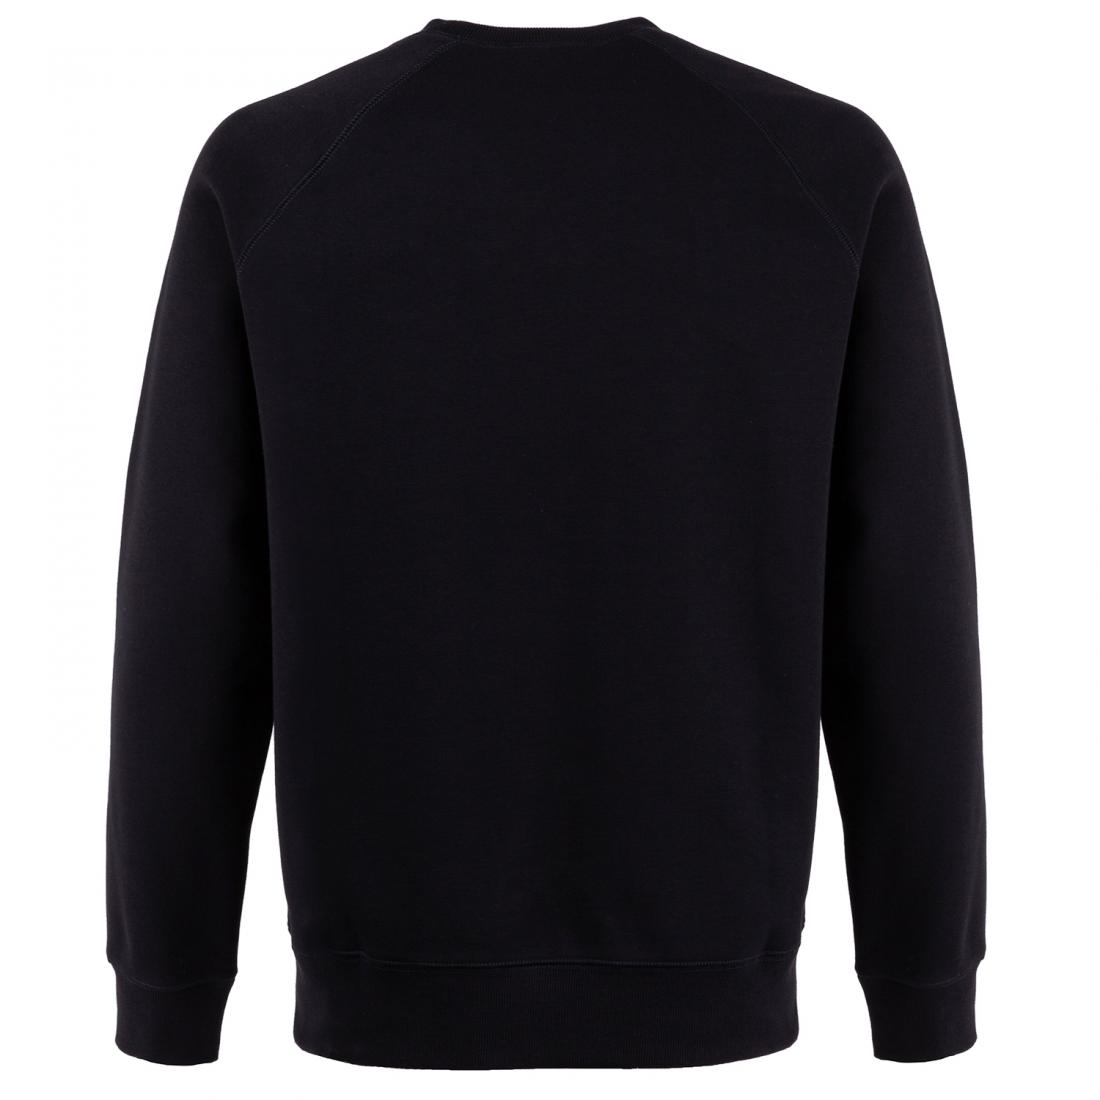 Свитшот Carhartt Chase Sweatshirt купить в Boardshop №1